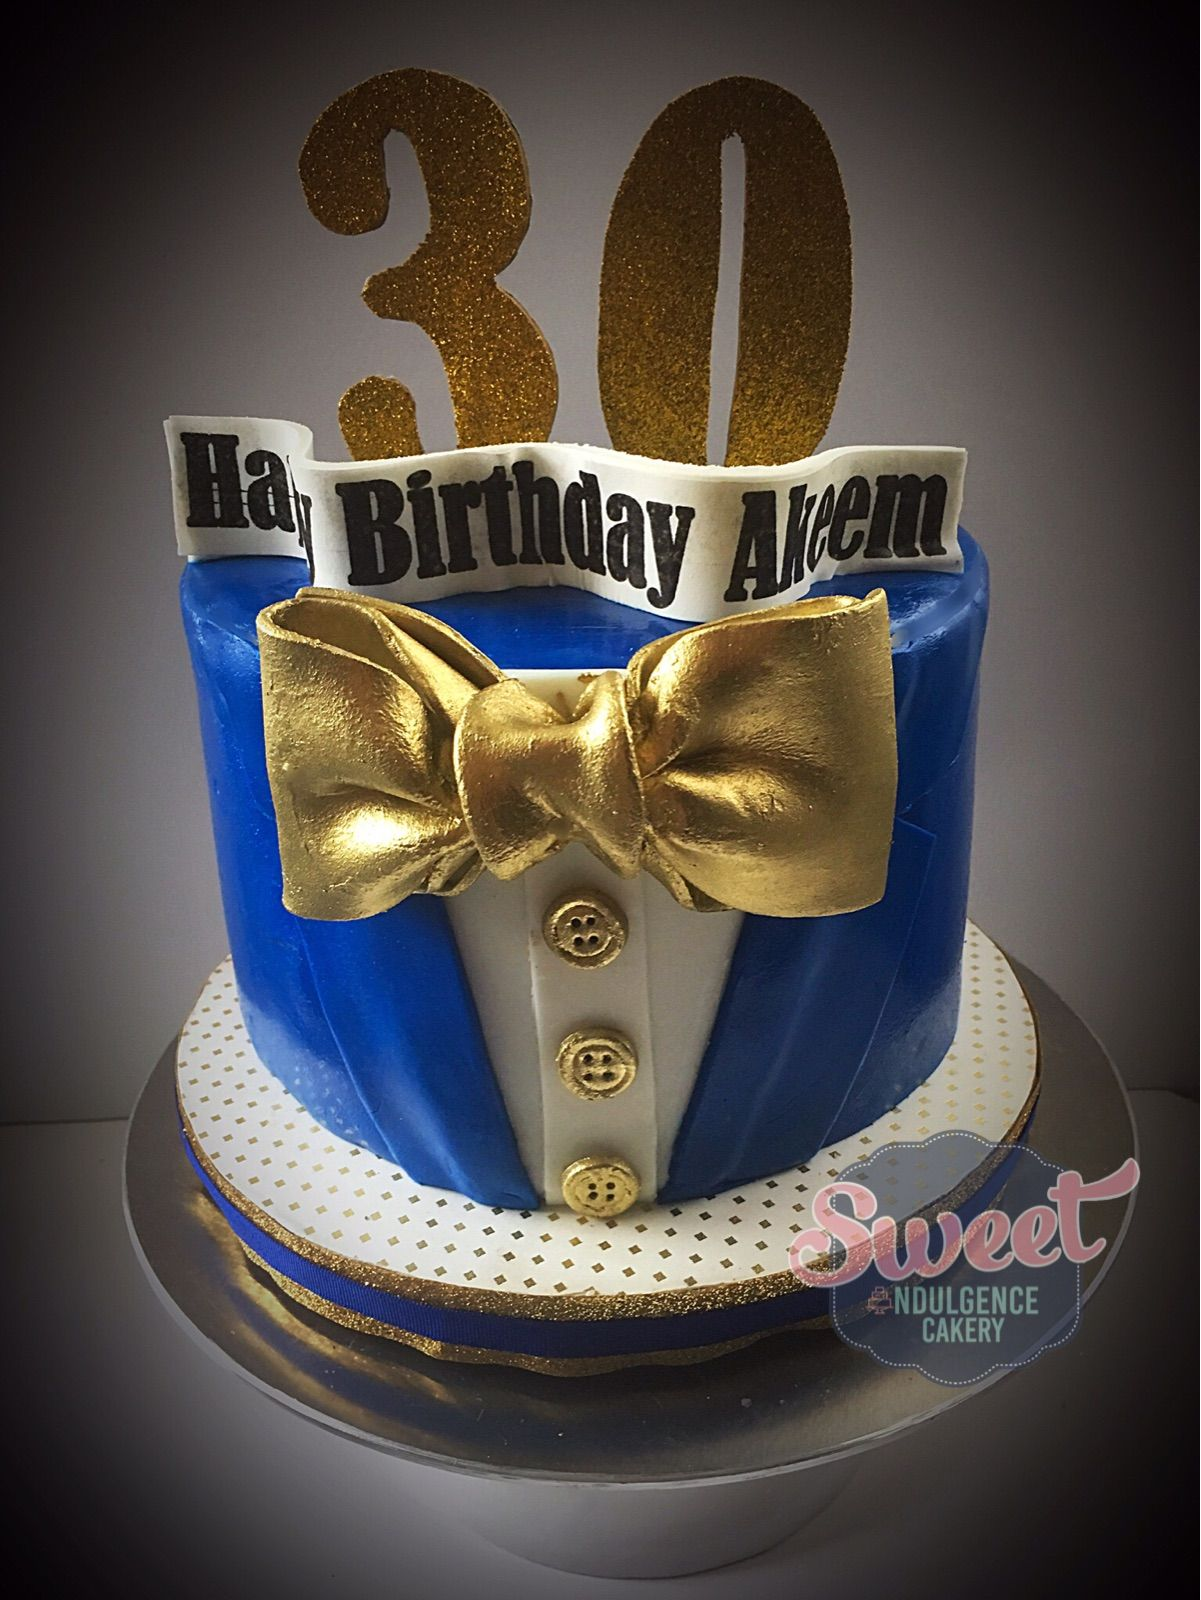 30th birthday blue and gold tux cake Cake, 30th birthday